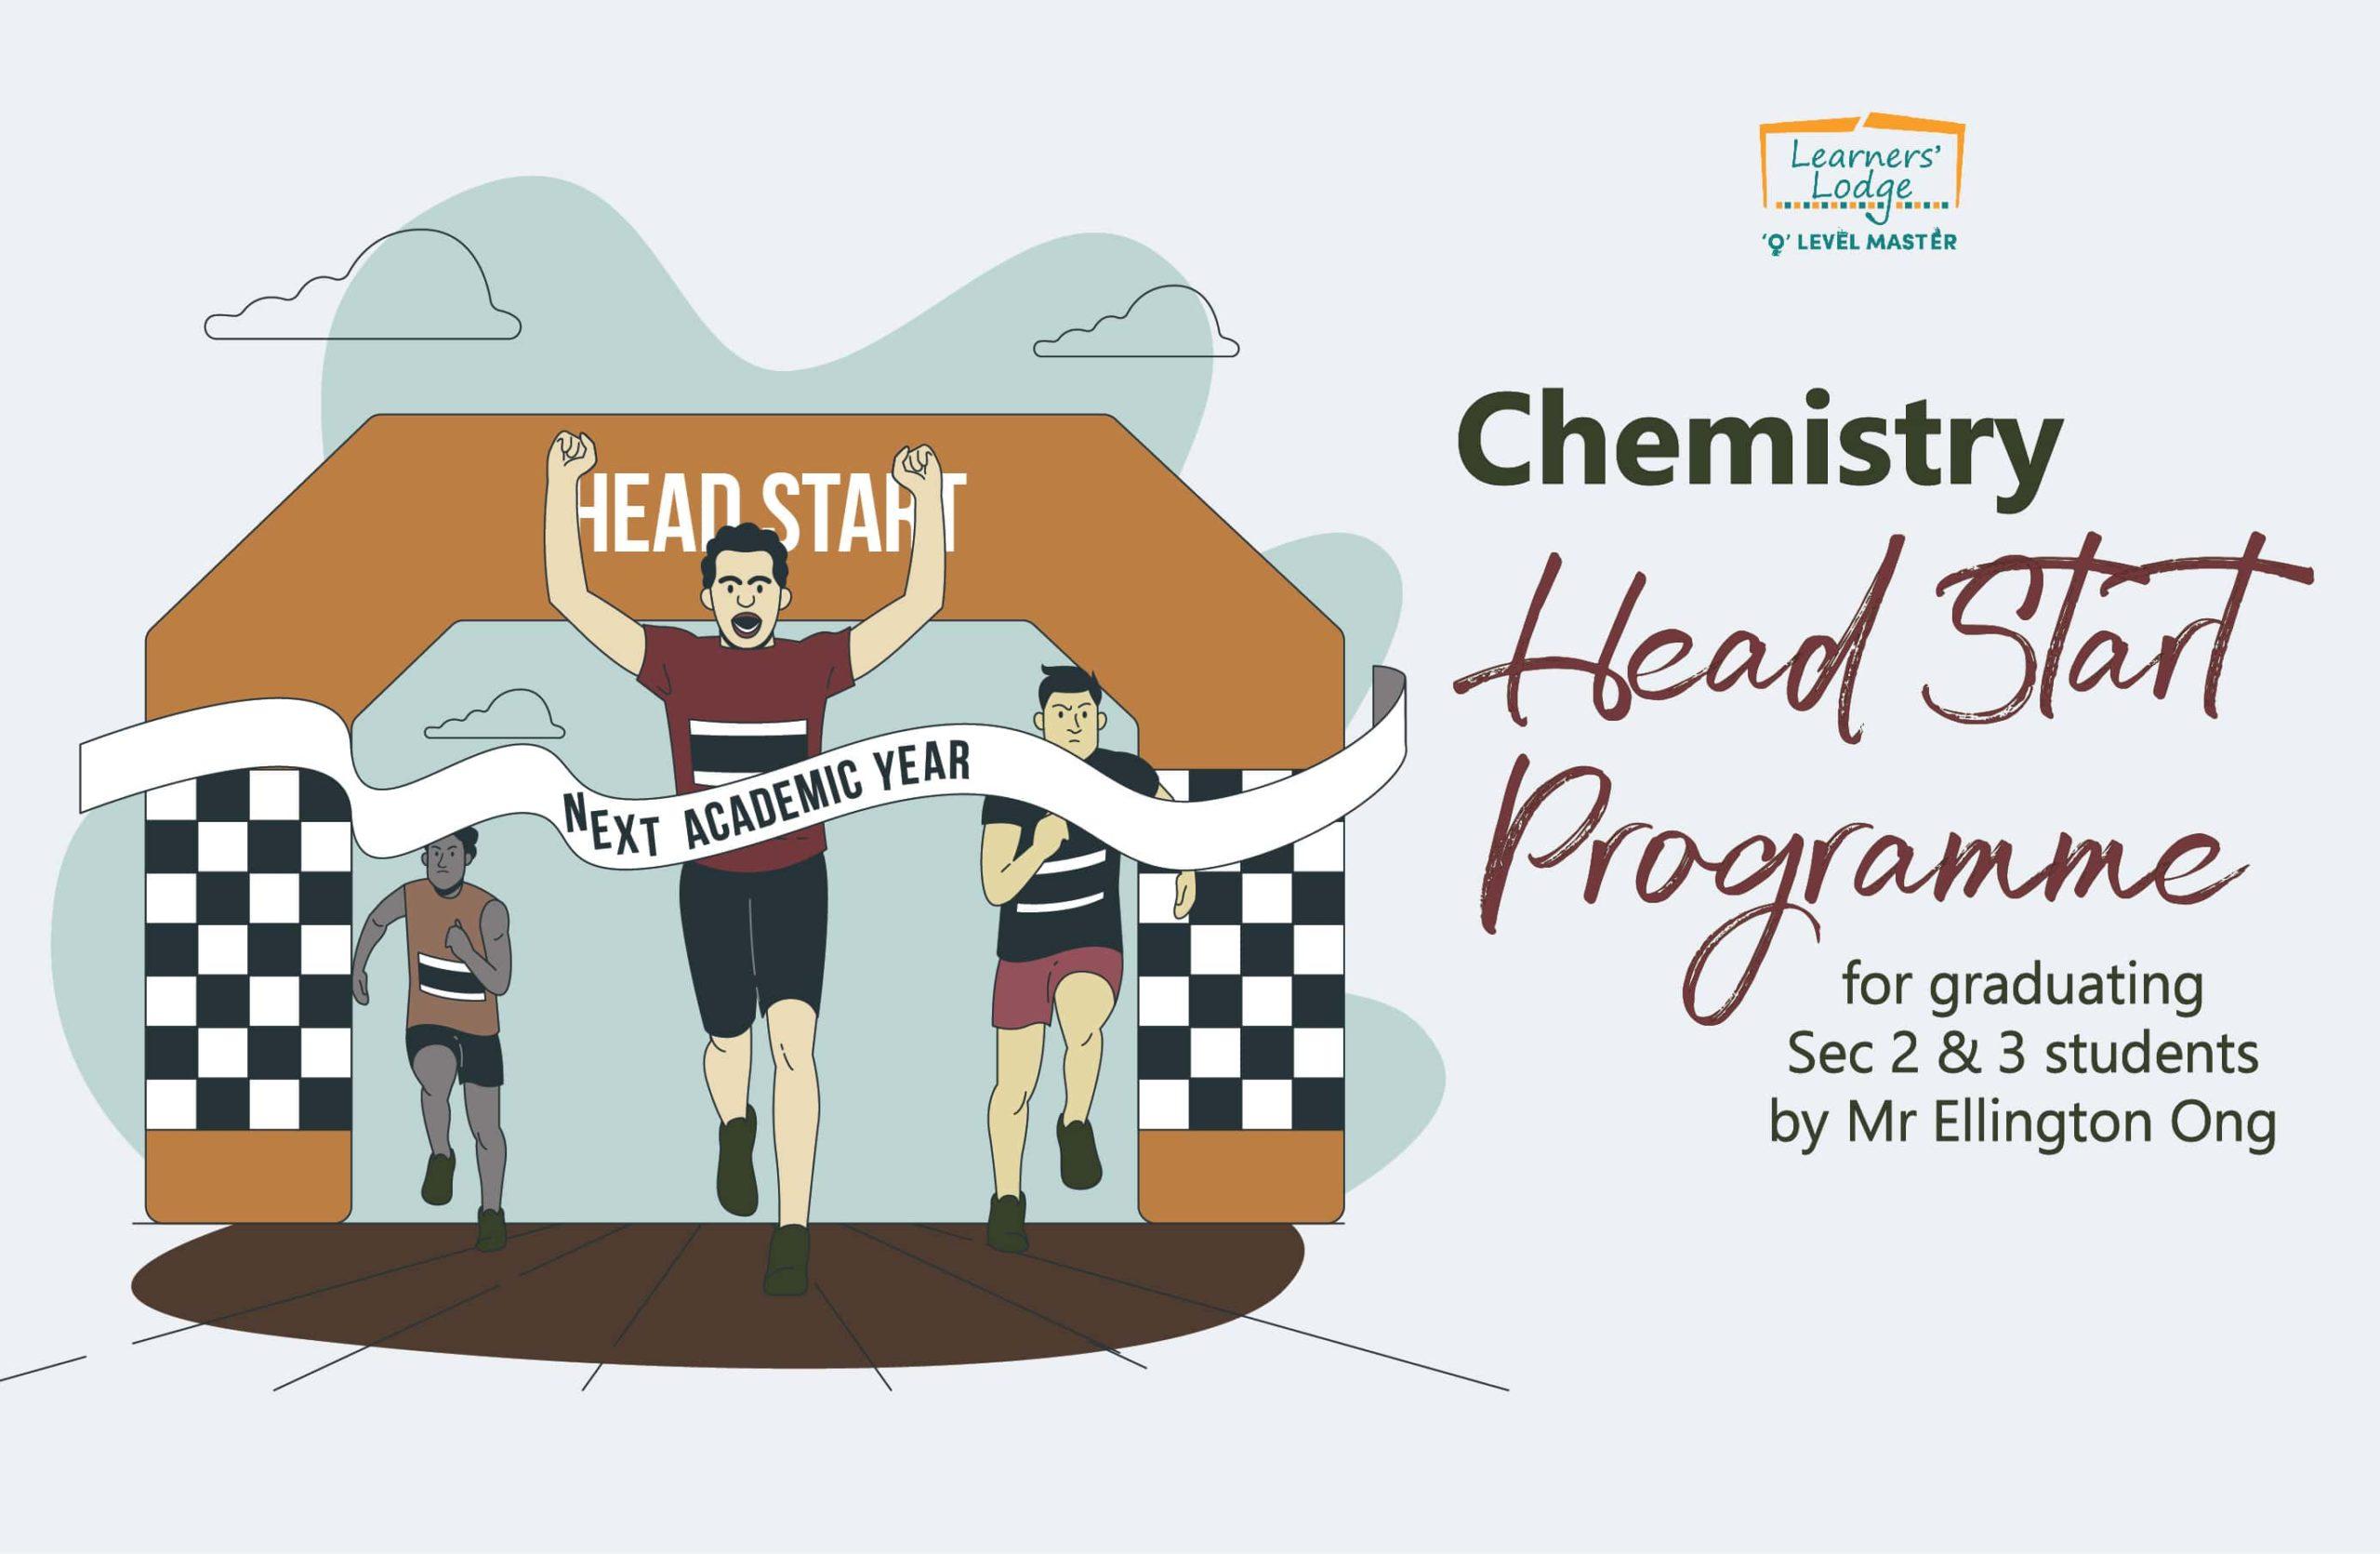 Chemistry Head Start Programme